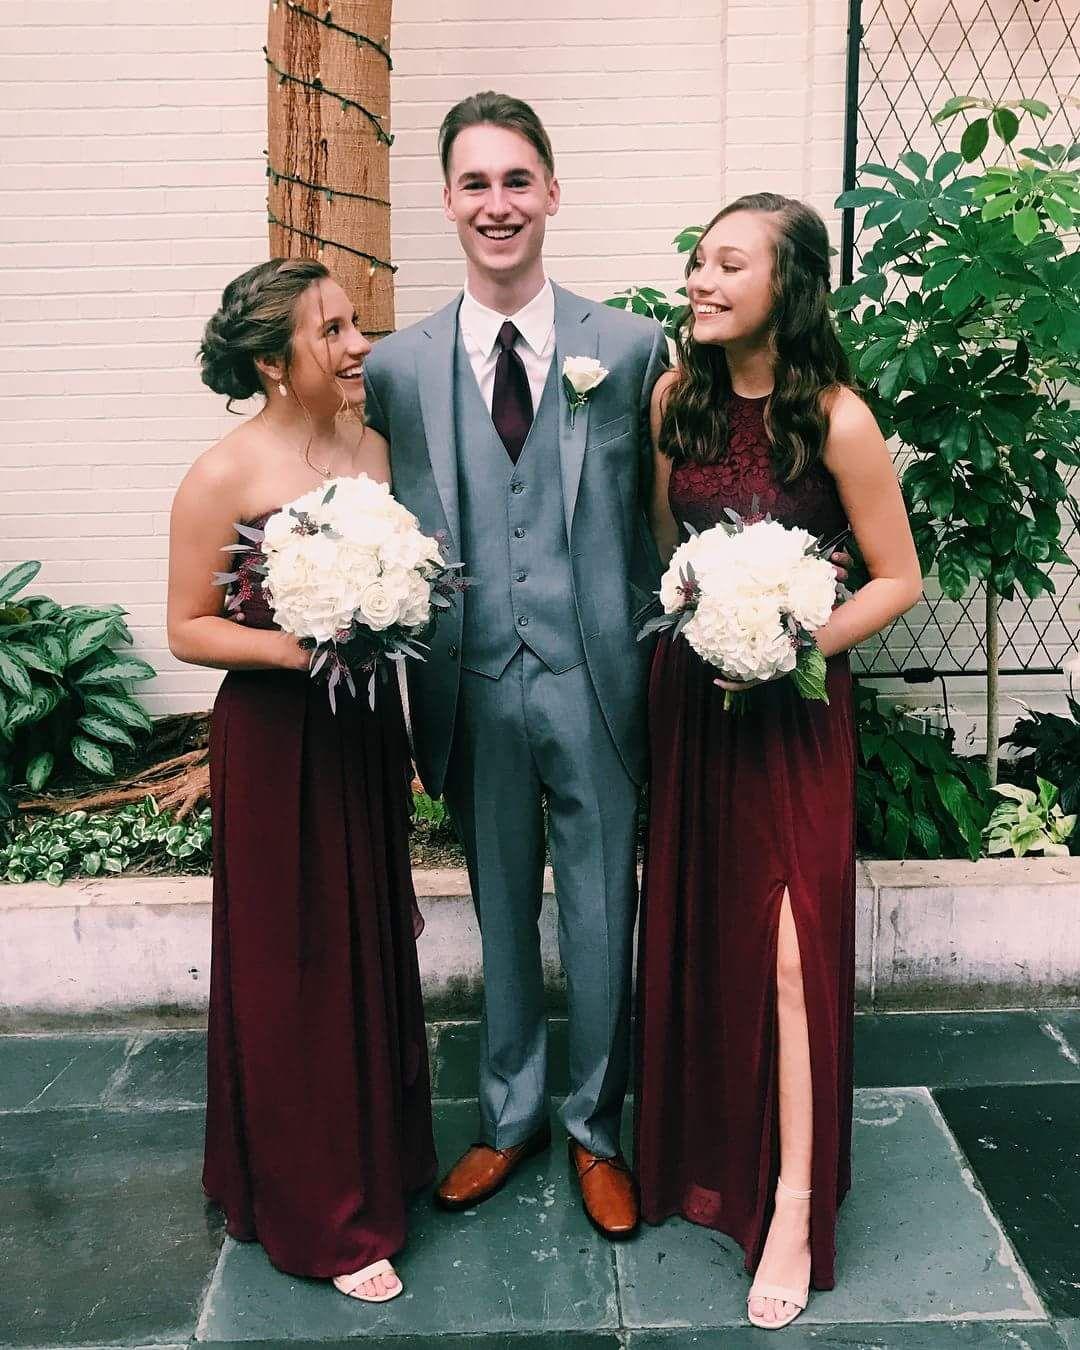 8ddfc192c51 Maddie and Kenzie    Did Melissa get married